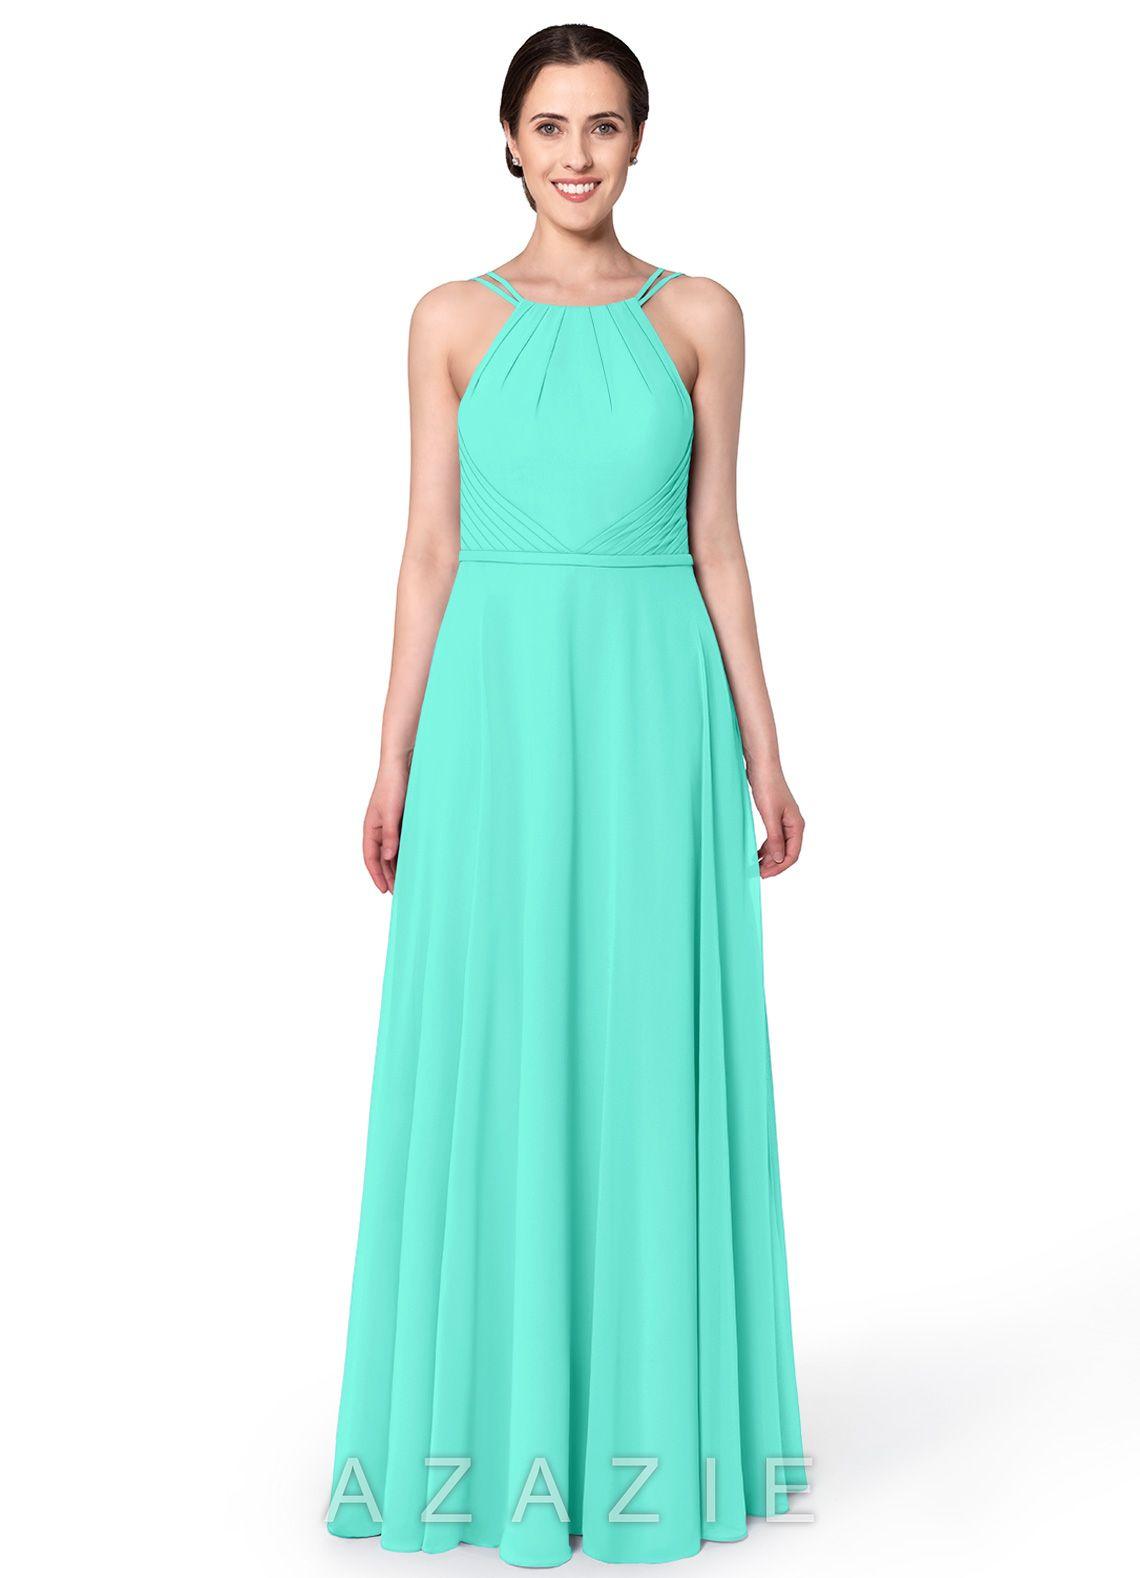 30c72ddbcf7 Azazie Melinda Bridesmaid Dresses